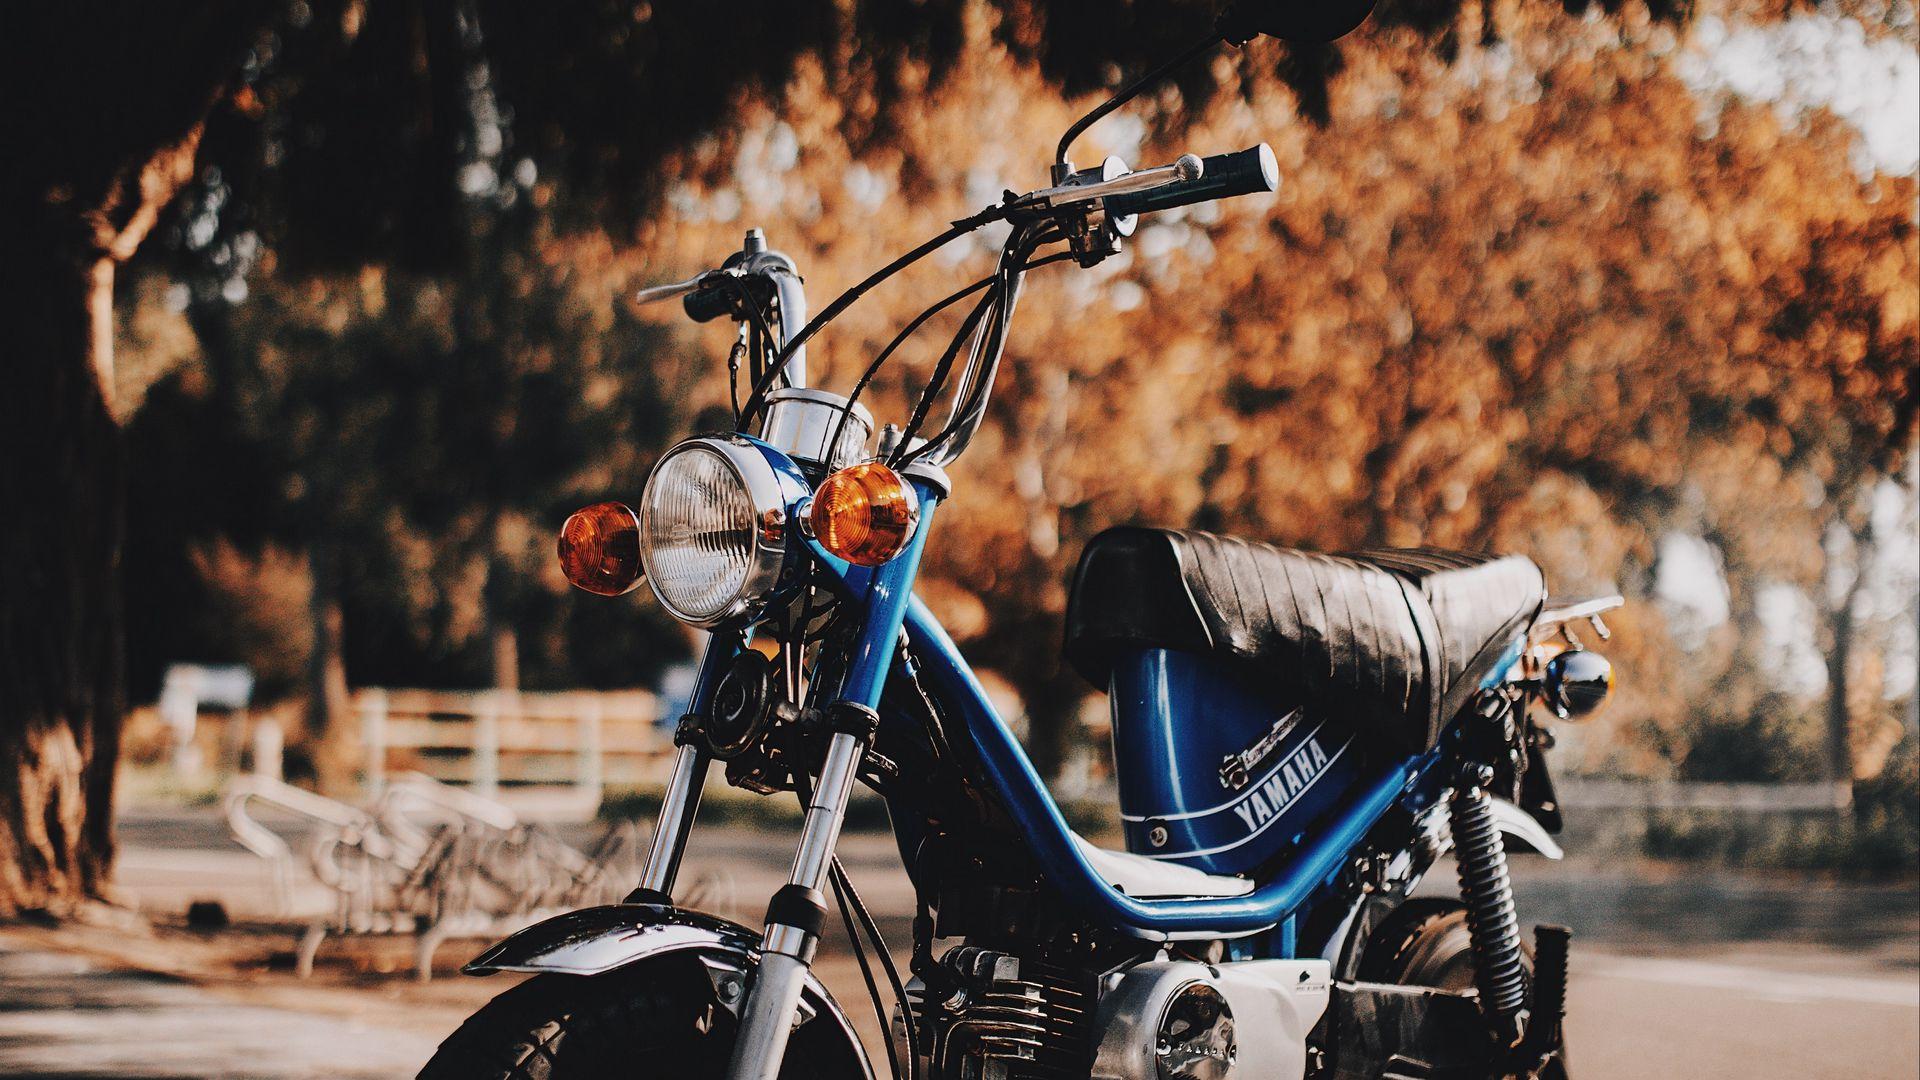 Yamaha, Bike, Motorcycle Best Wallpapers Free Download